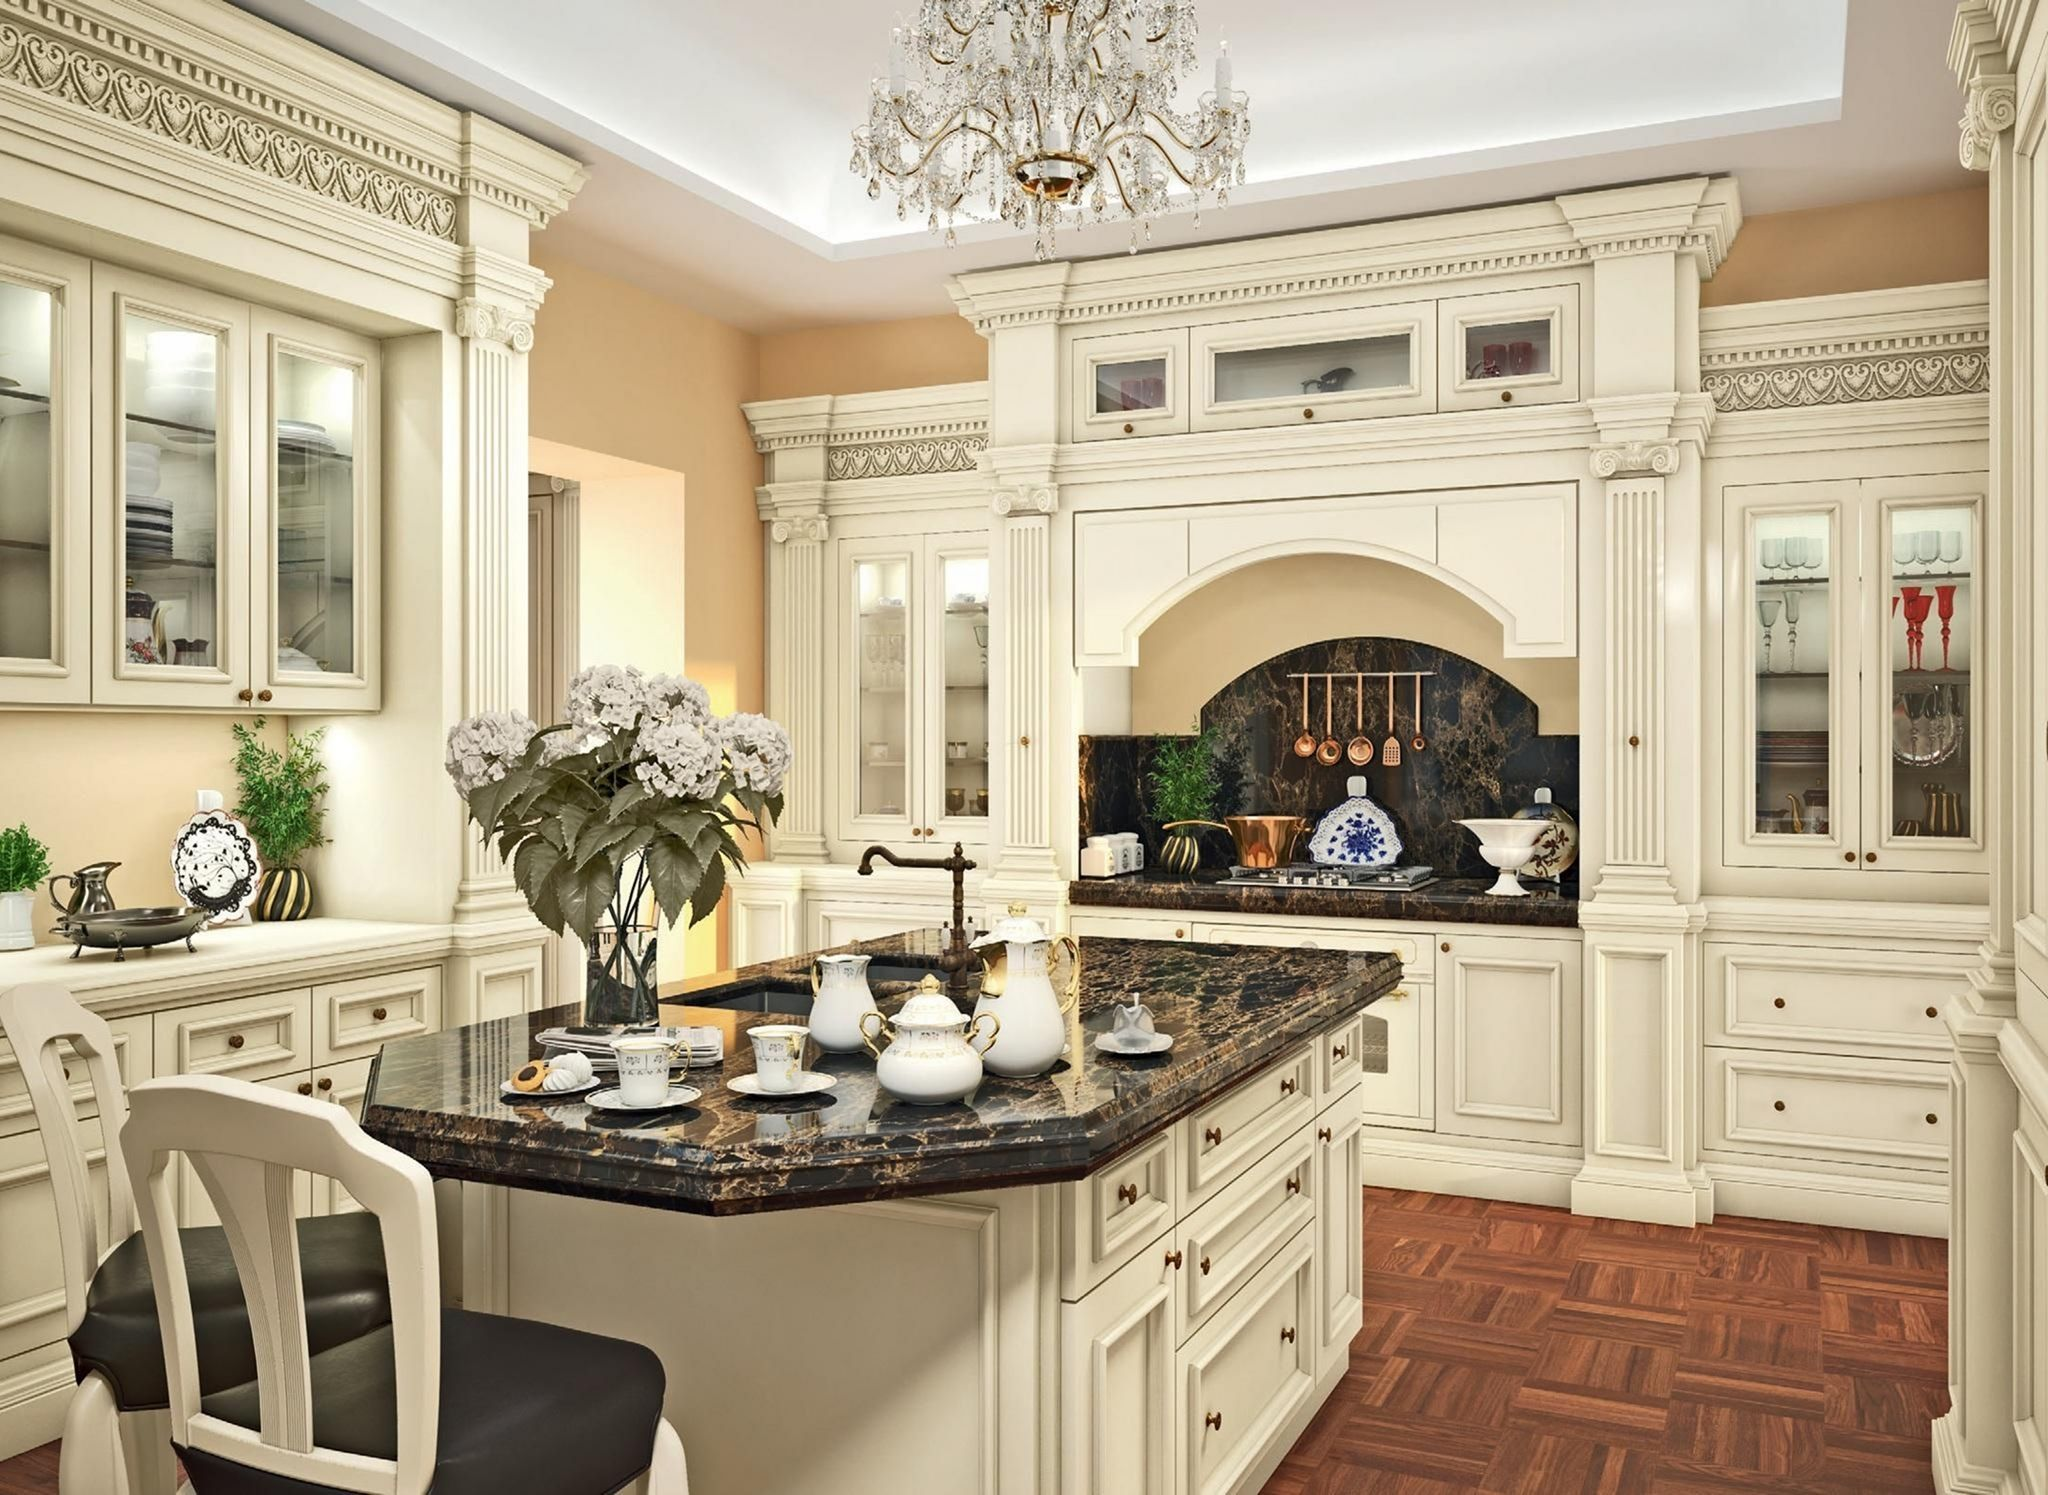 30 classic luxurious kitchen design ideas that you must on awesome modern kitchen design ideas id=83977